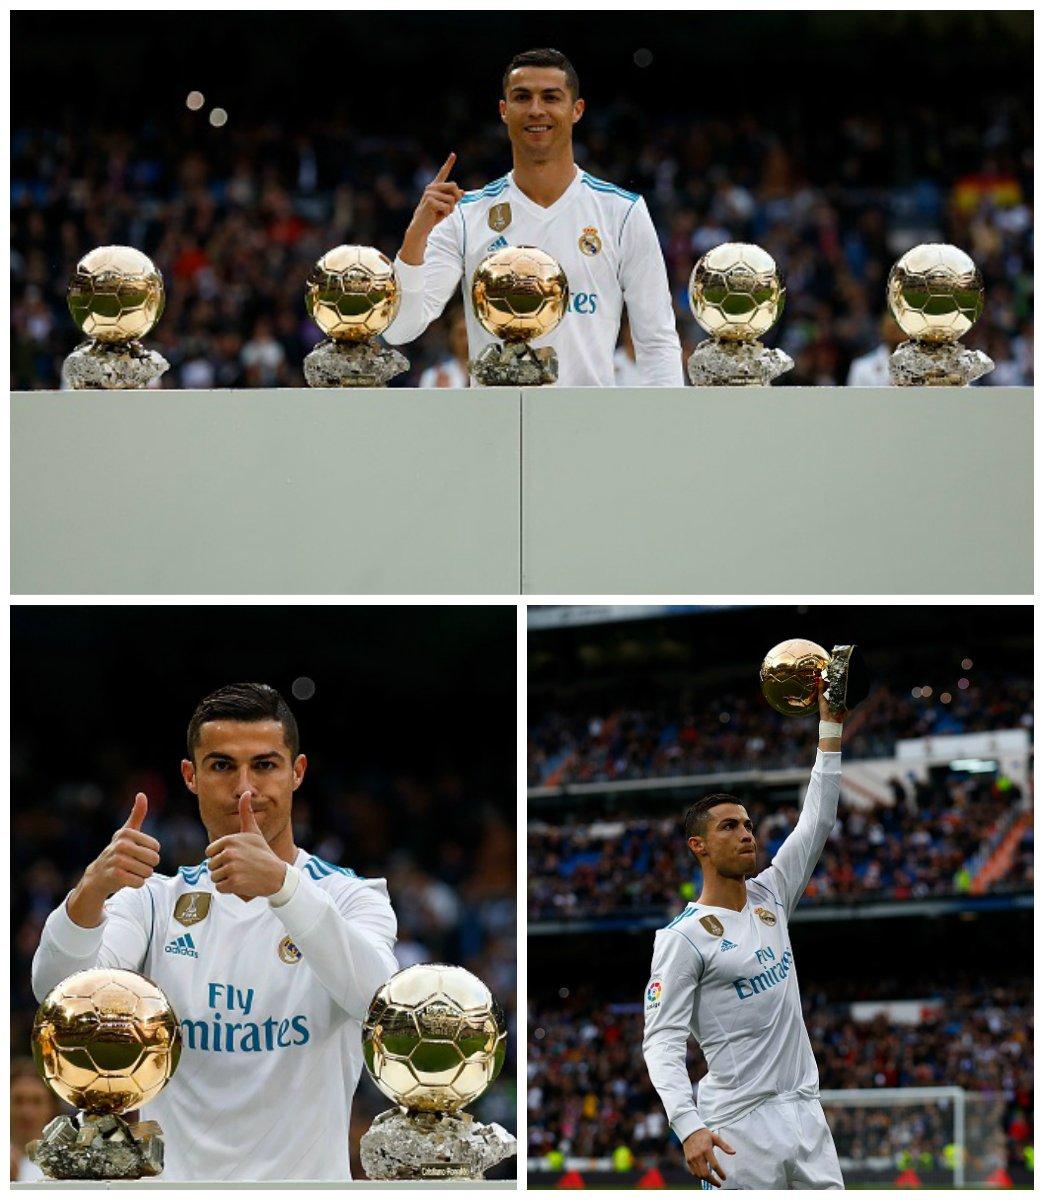 1⃣...2⃣...3⃣...4⃣...5⃣... ⚽-⚽-⚽-⚽-⚽  @Cristiano #Ronaldo festeggia al Bérnabeu 🎉🎊👏  #BallondOr